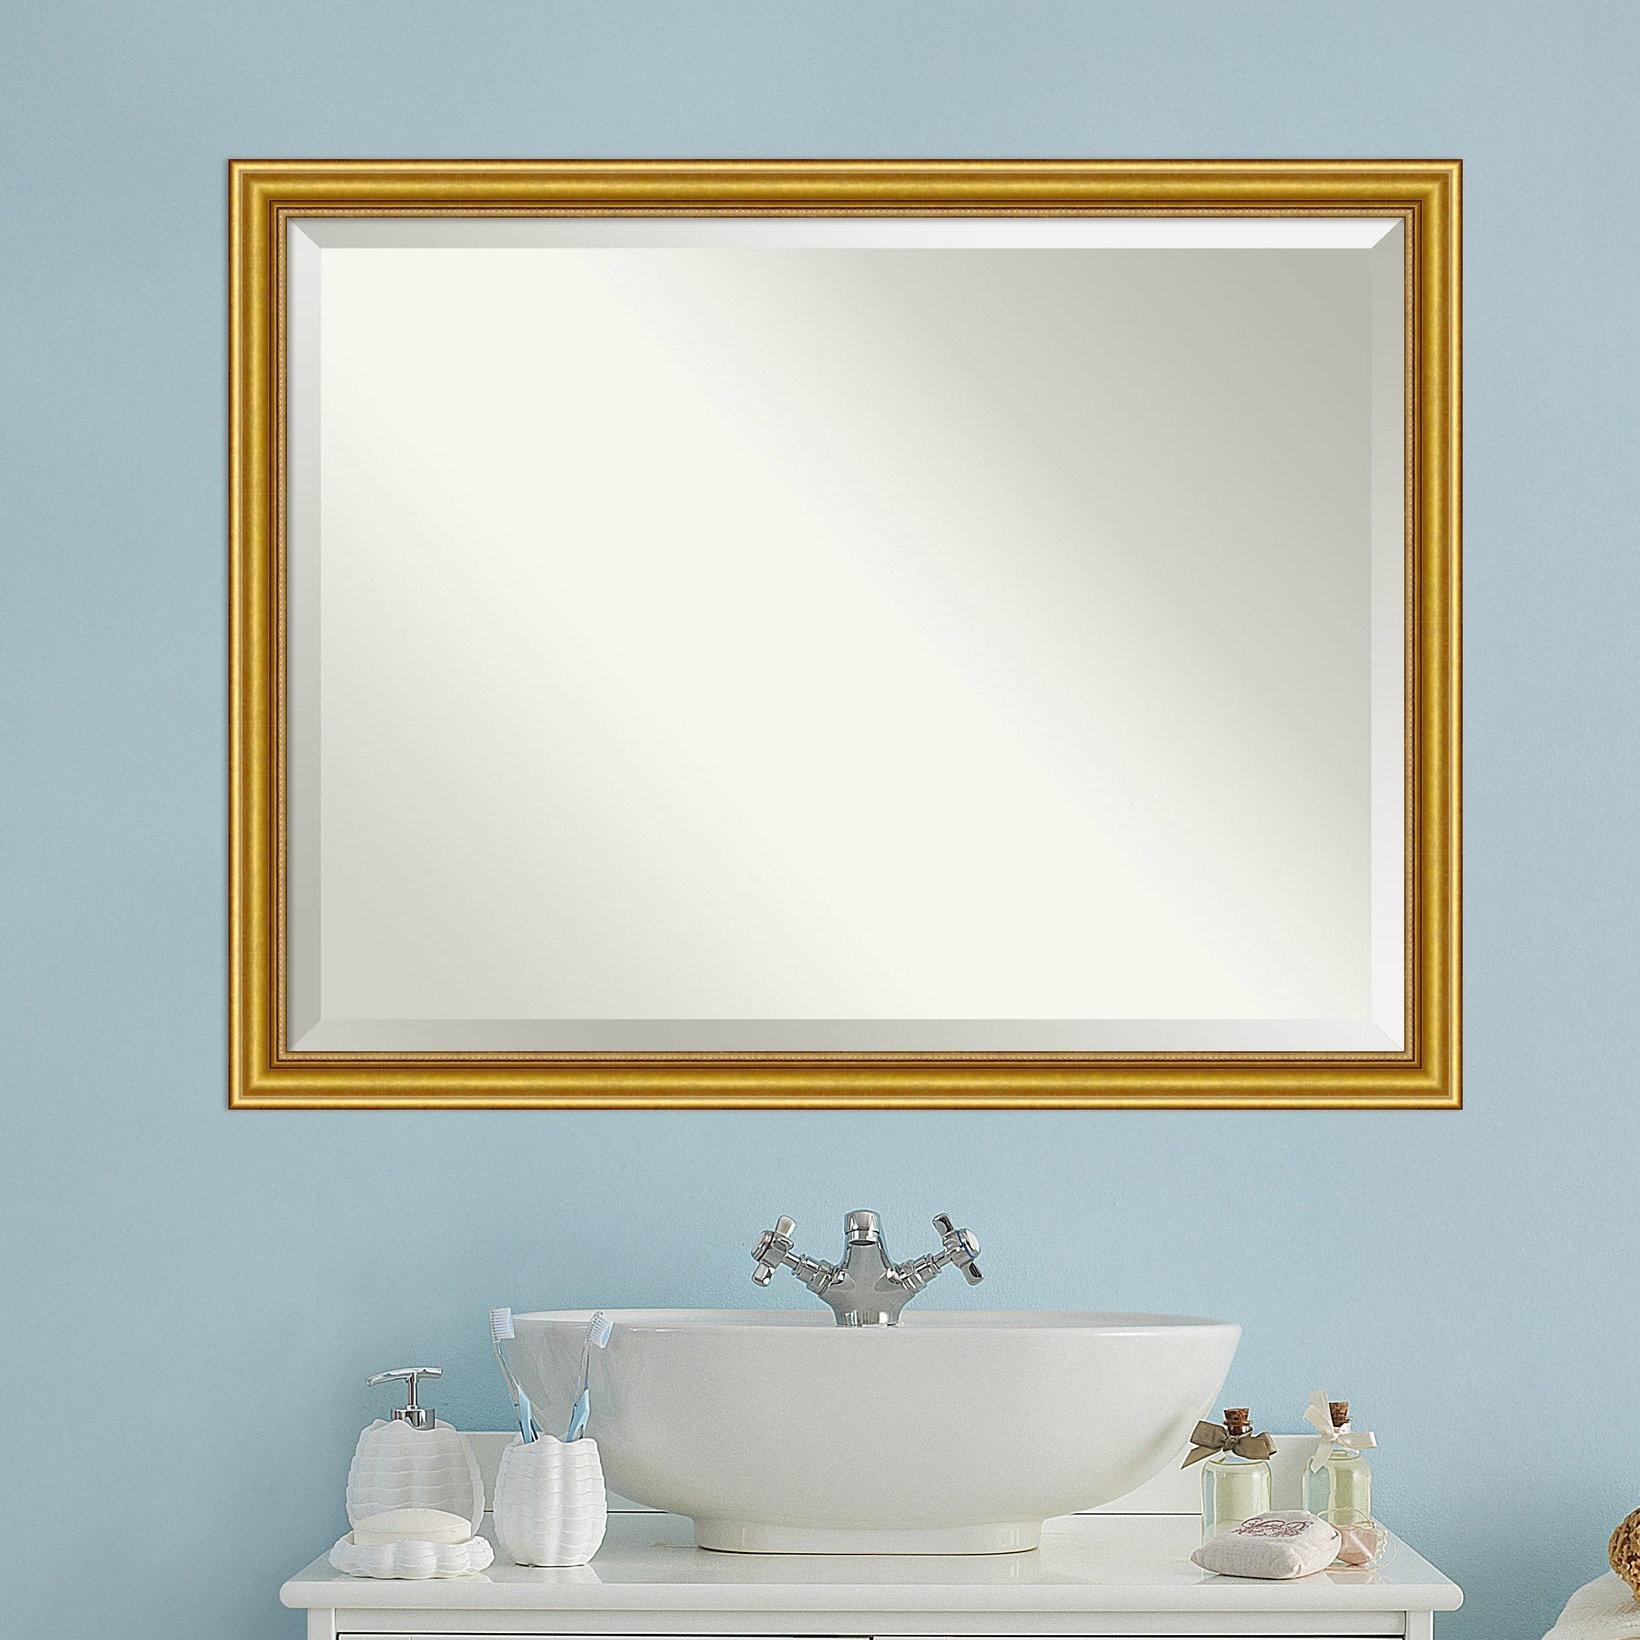 Rustic Wood Framed Mirror   Wayfair For Padang Irregular Wood Framed Wall Mirrors (View 7 of 20)